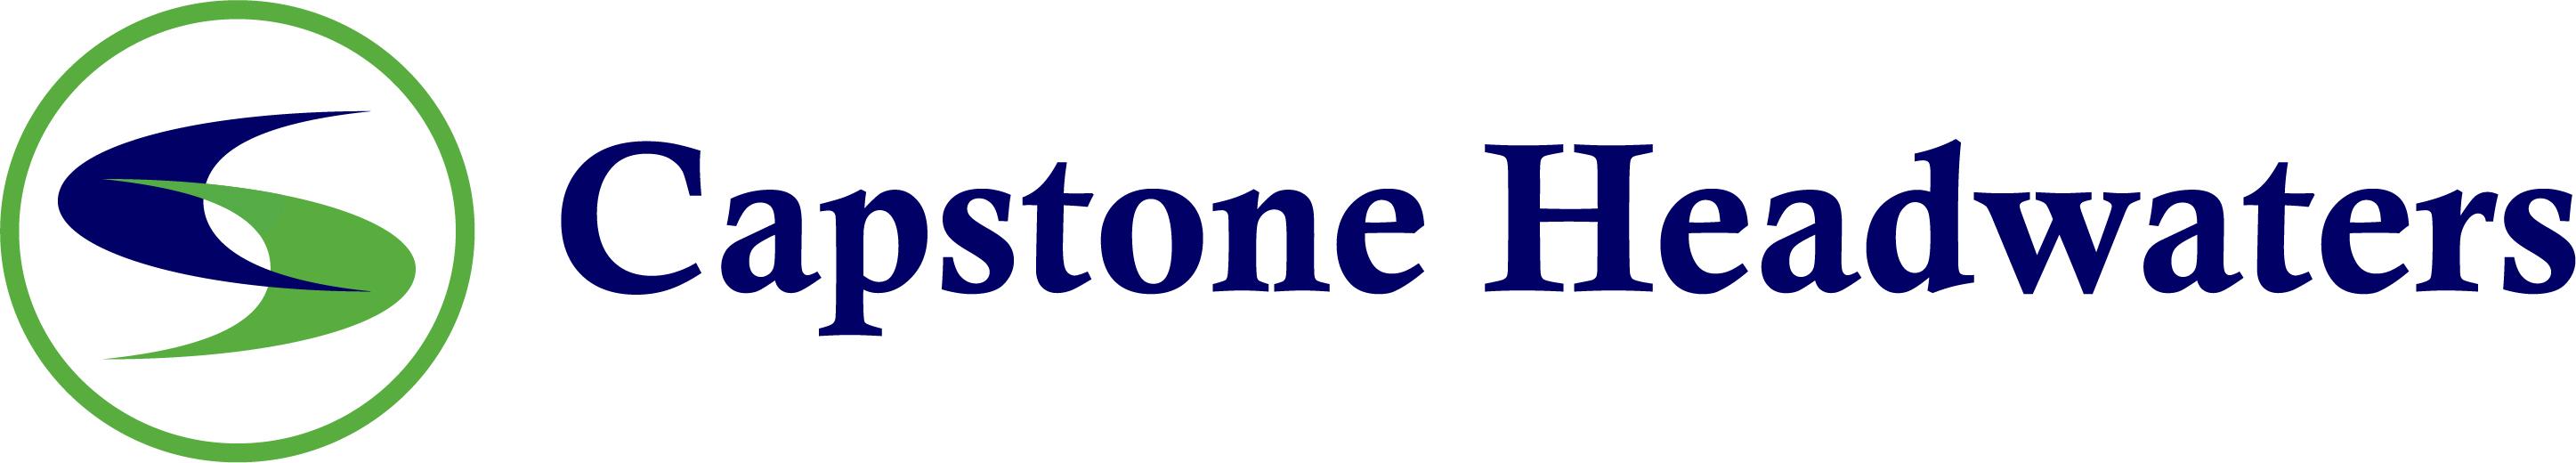 Capstone Headwaters Horizontal Logo - Blue.jpg